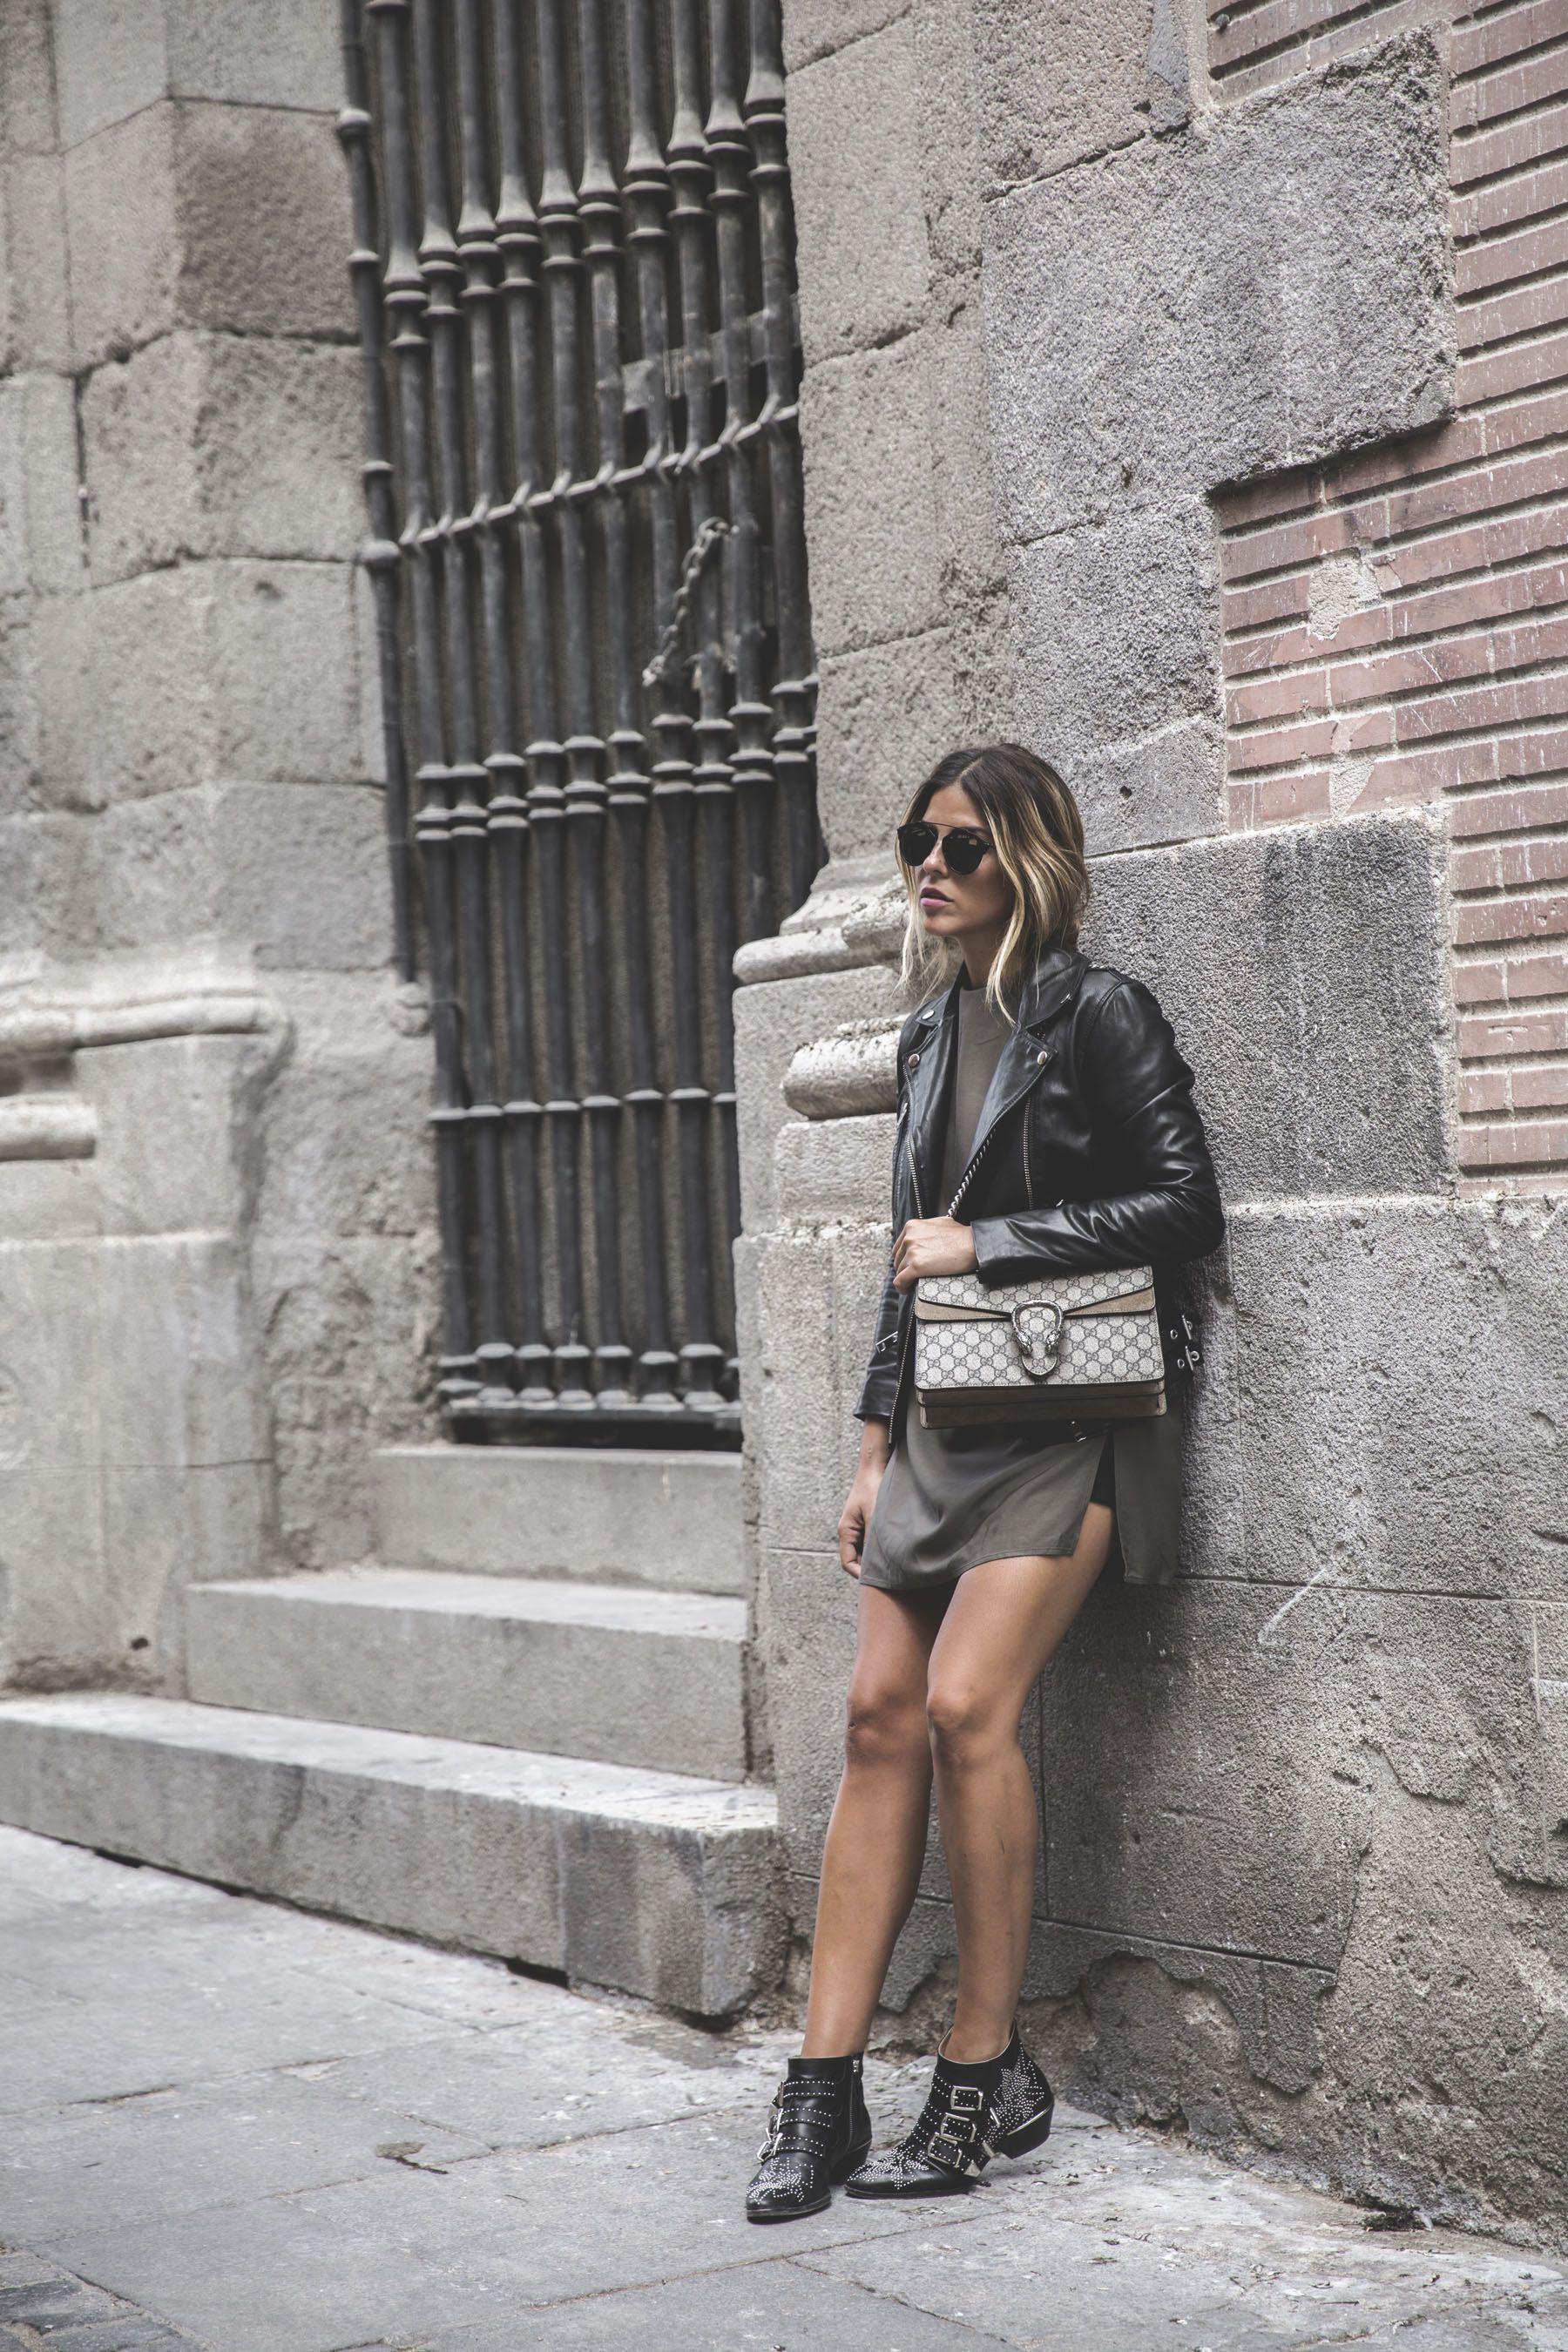 Trendy Taste – The Jacket. Khaki and black little dress+black ankle boots+black leather jacekt+beige Gucci Dionyuss bag+sunglasses. Fall Outfit 2016